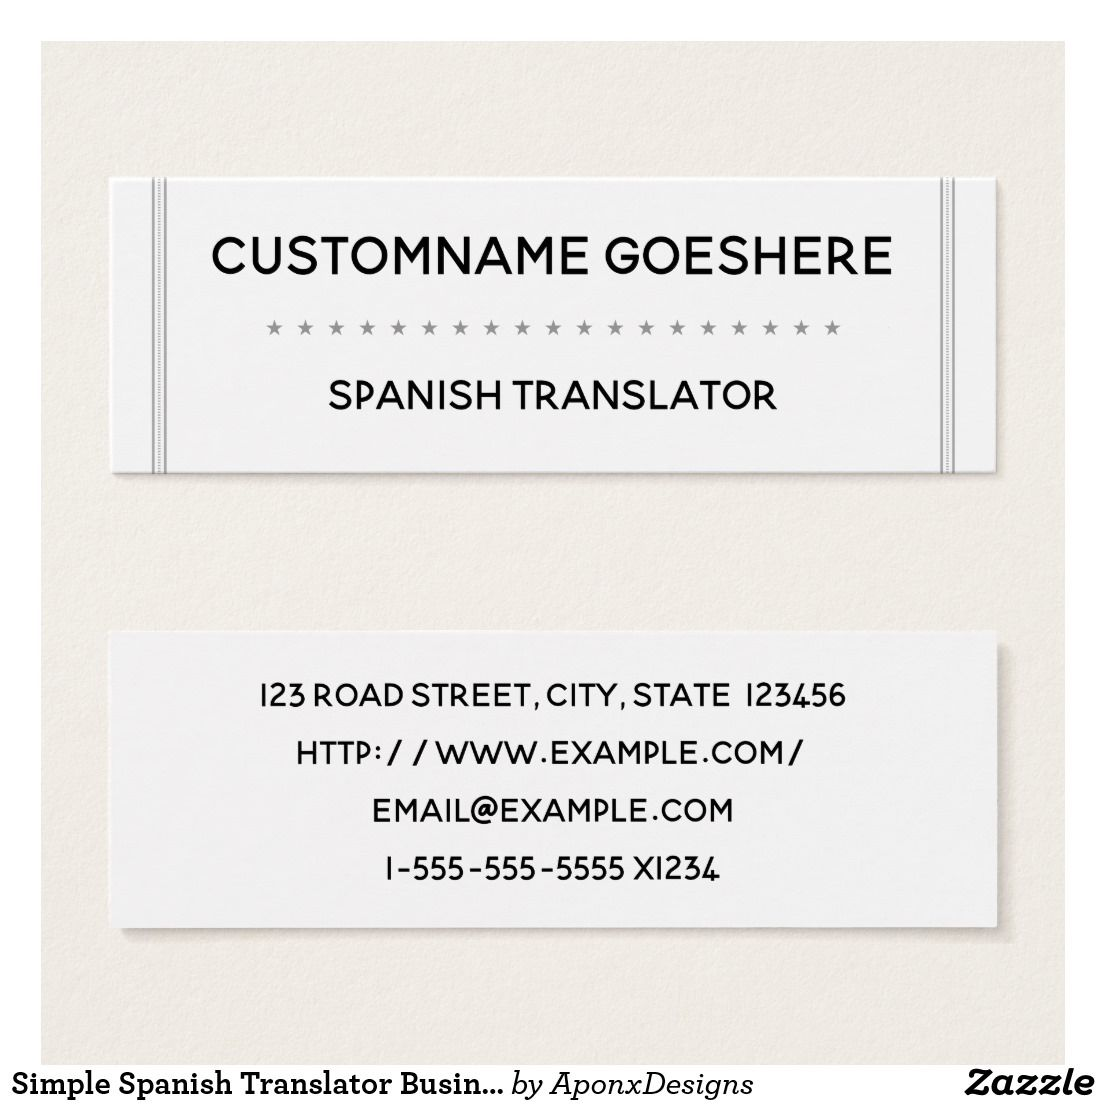 Simple Spanish Translator Business Card